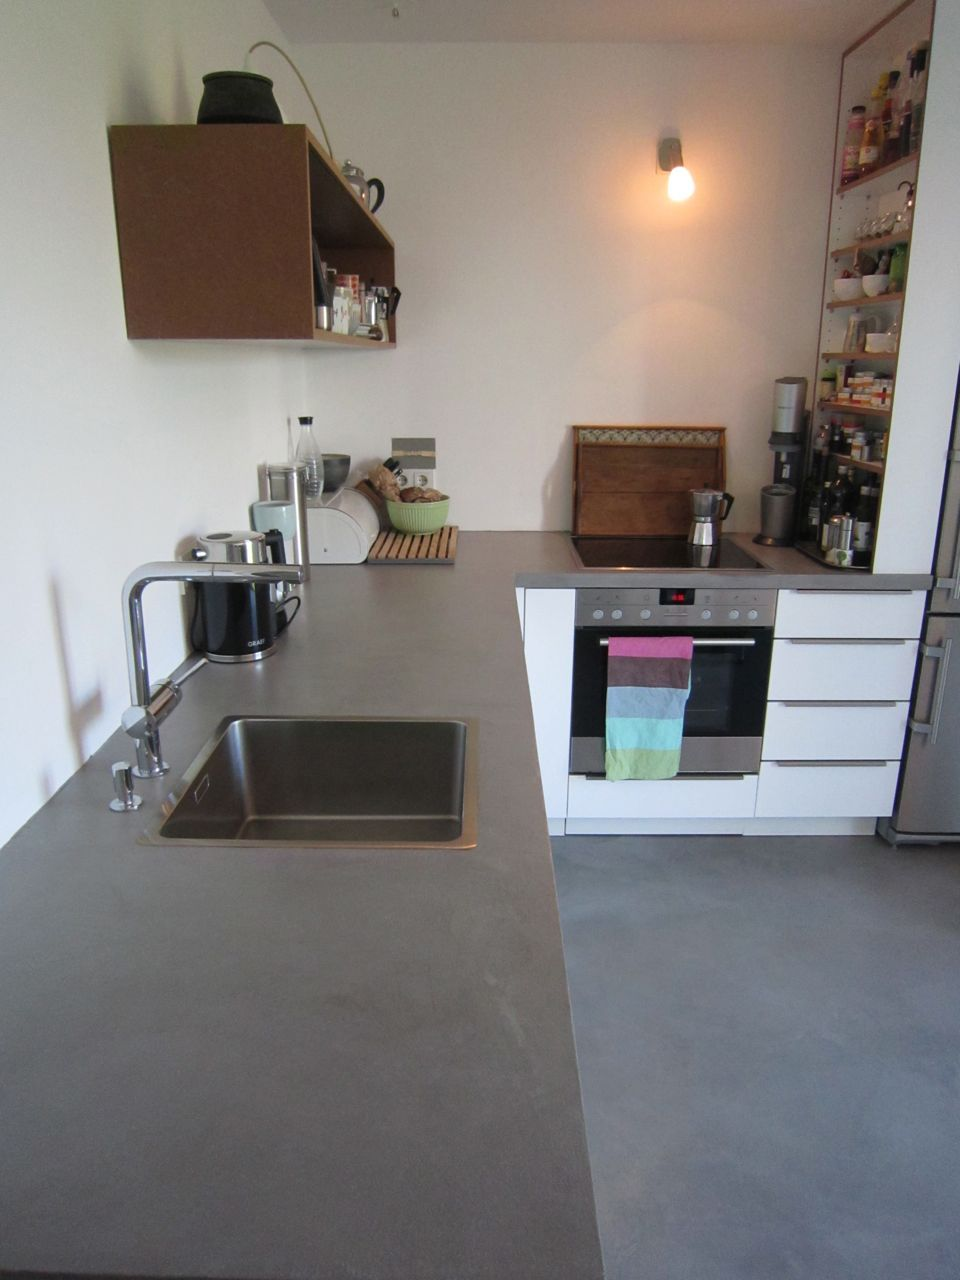 Küchenarbeitsplatte Betonoptik küchenarbeitsplatte boden beton look loft betonoptik